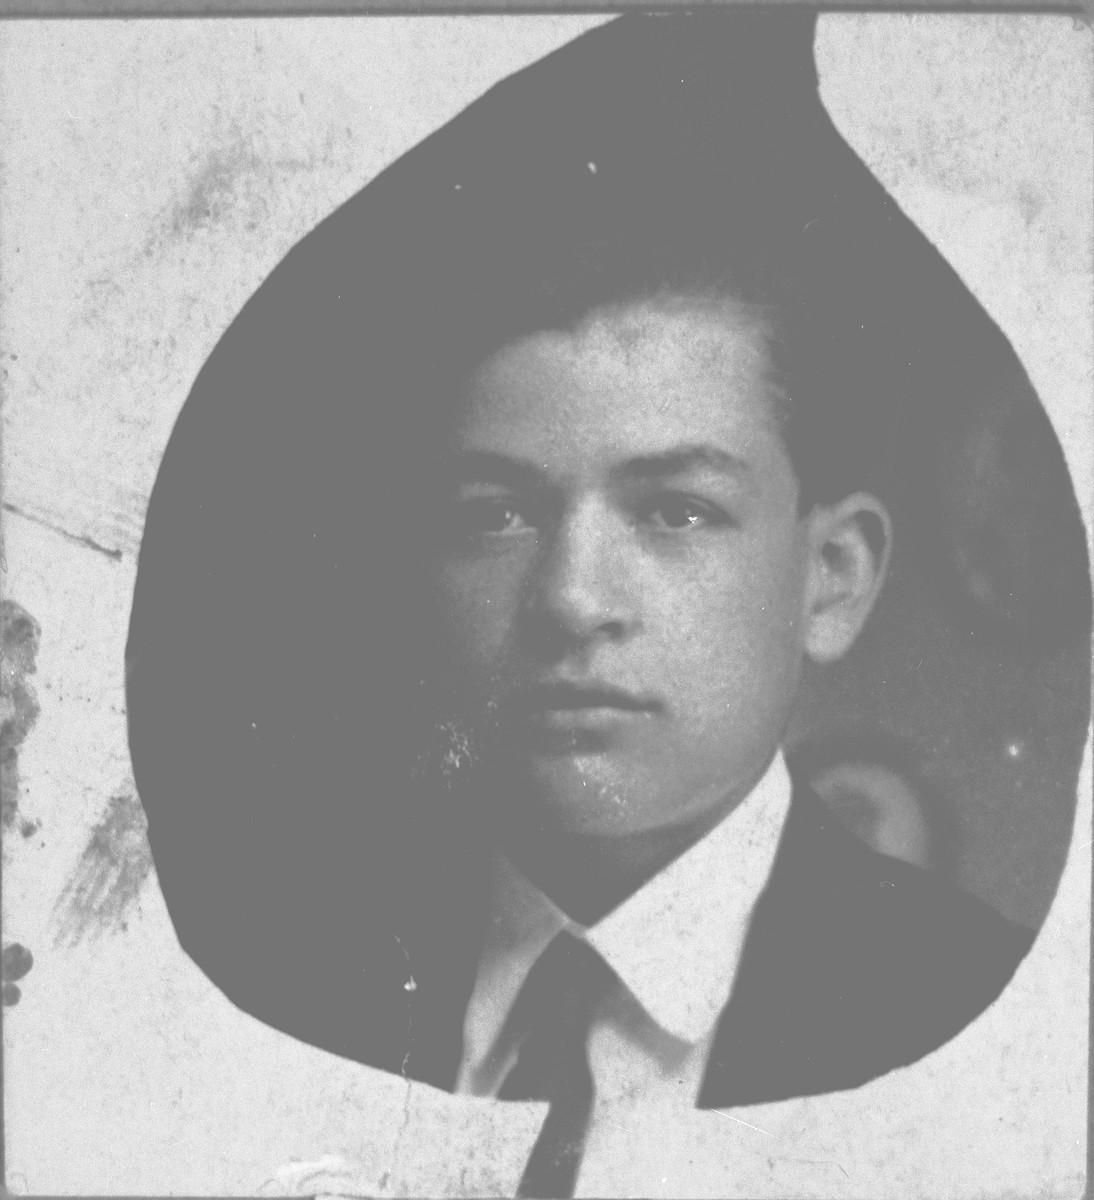 Portrait of Liyao Kamchi.  He lived at Karagoryeva 83 in Bitola.